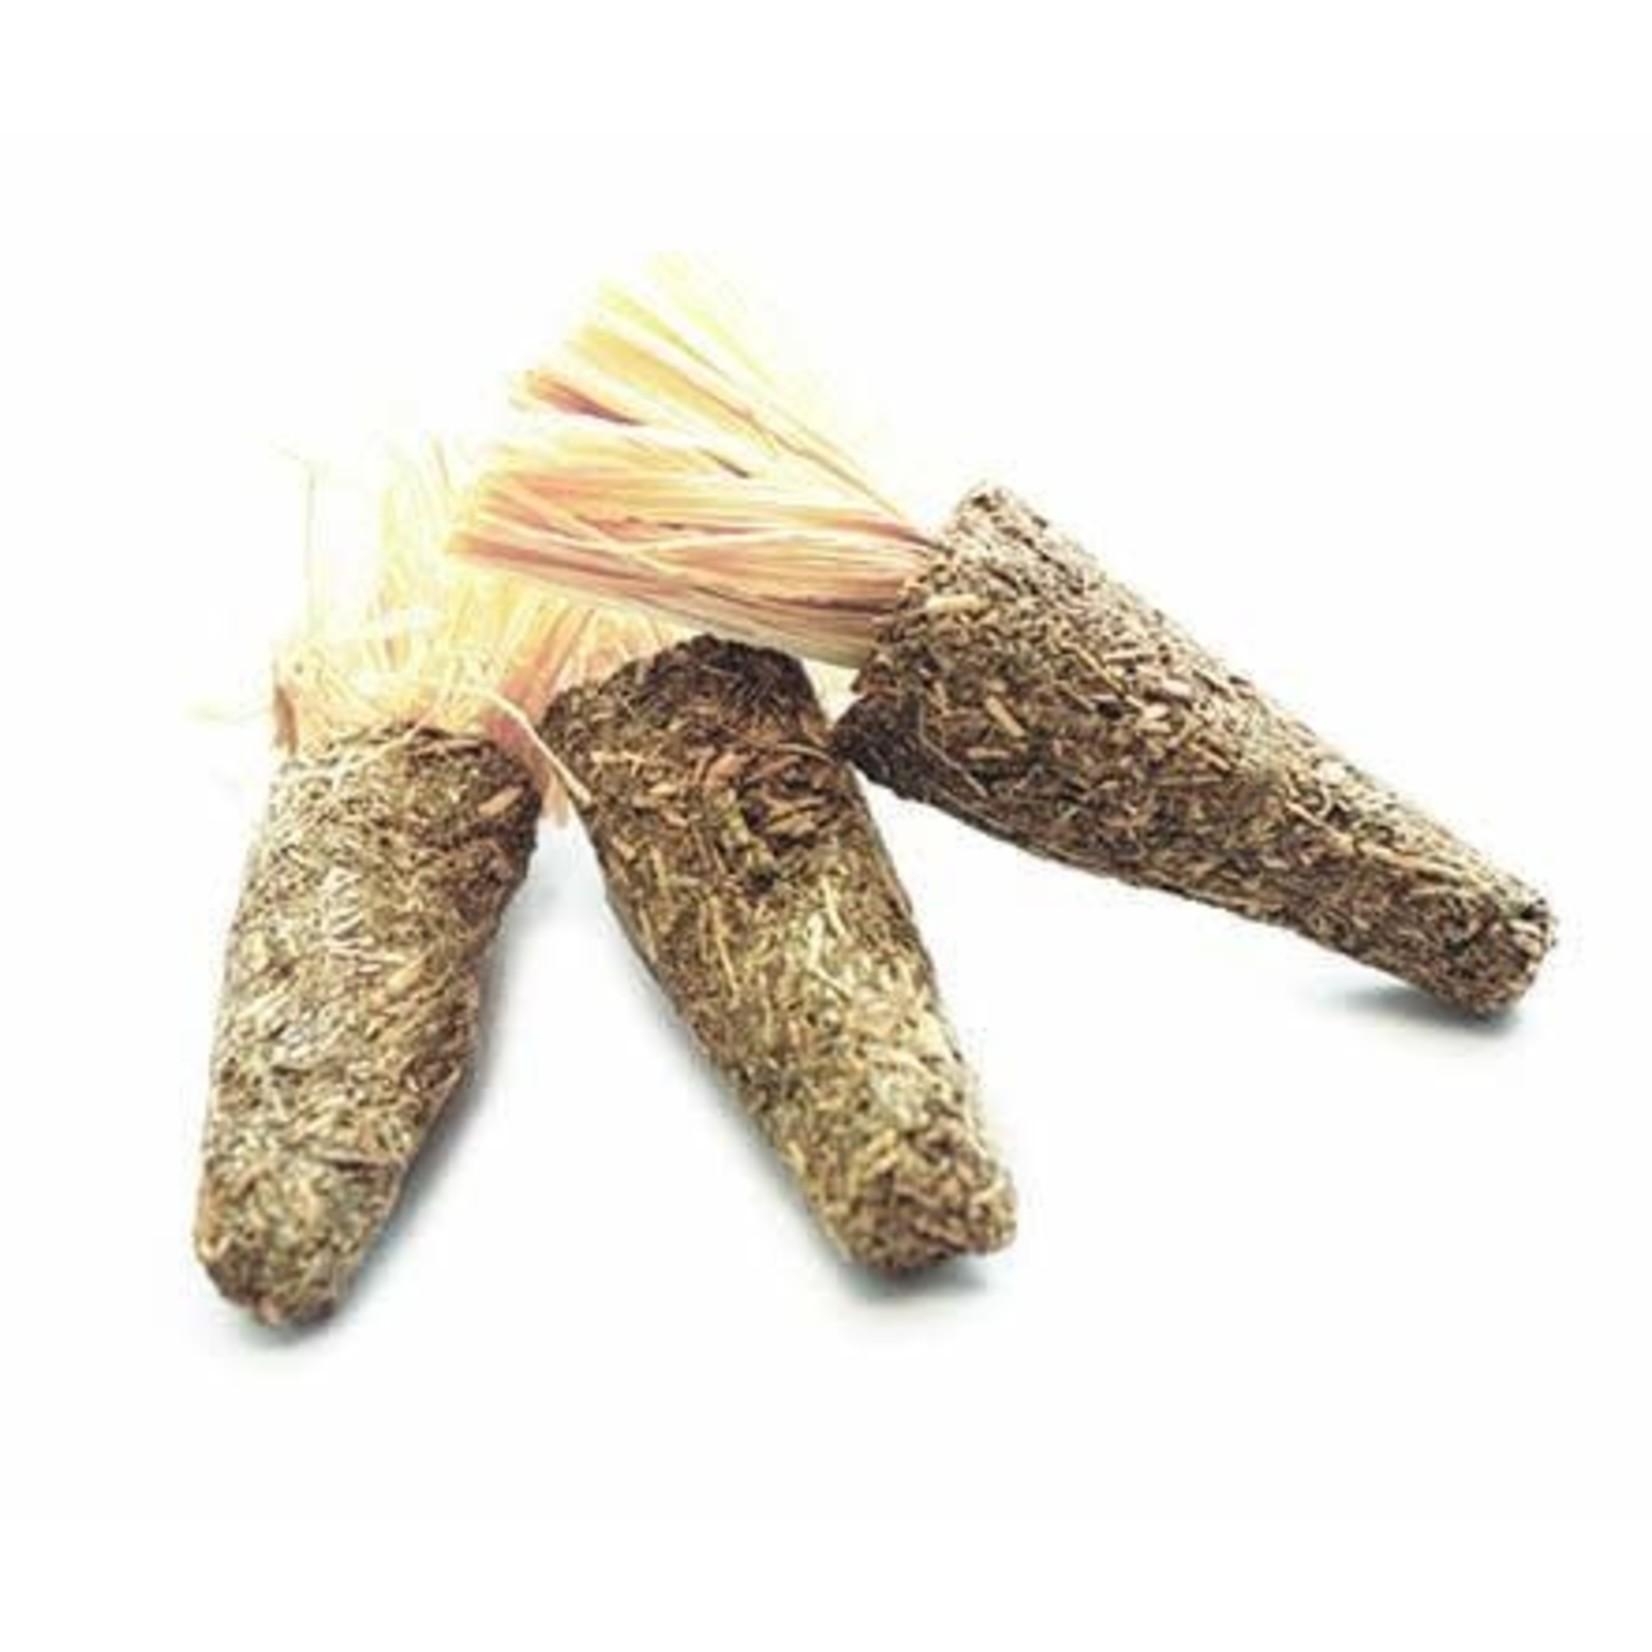 Happy Pet Alfalfa Mini Carrot Small Animal Treats, 3 pack